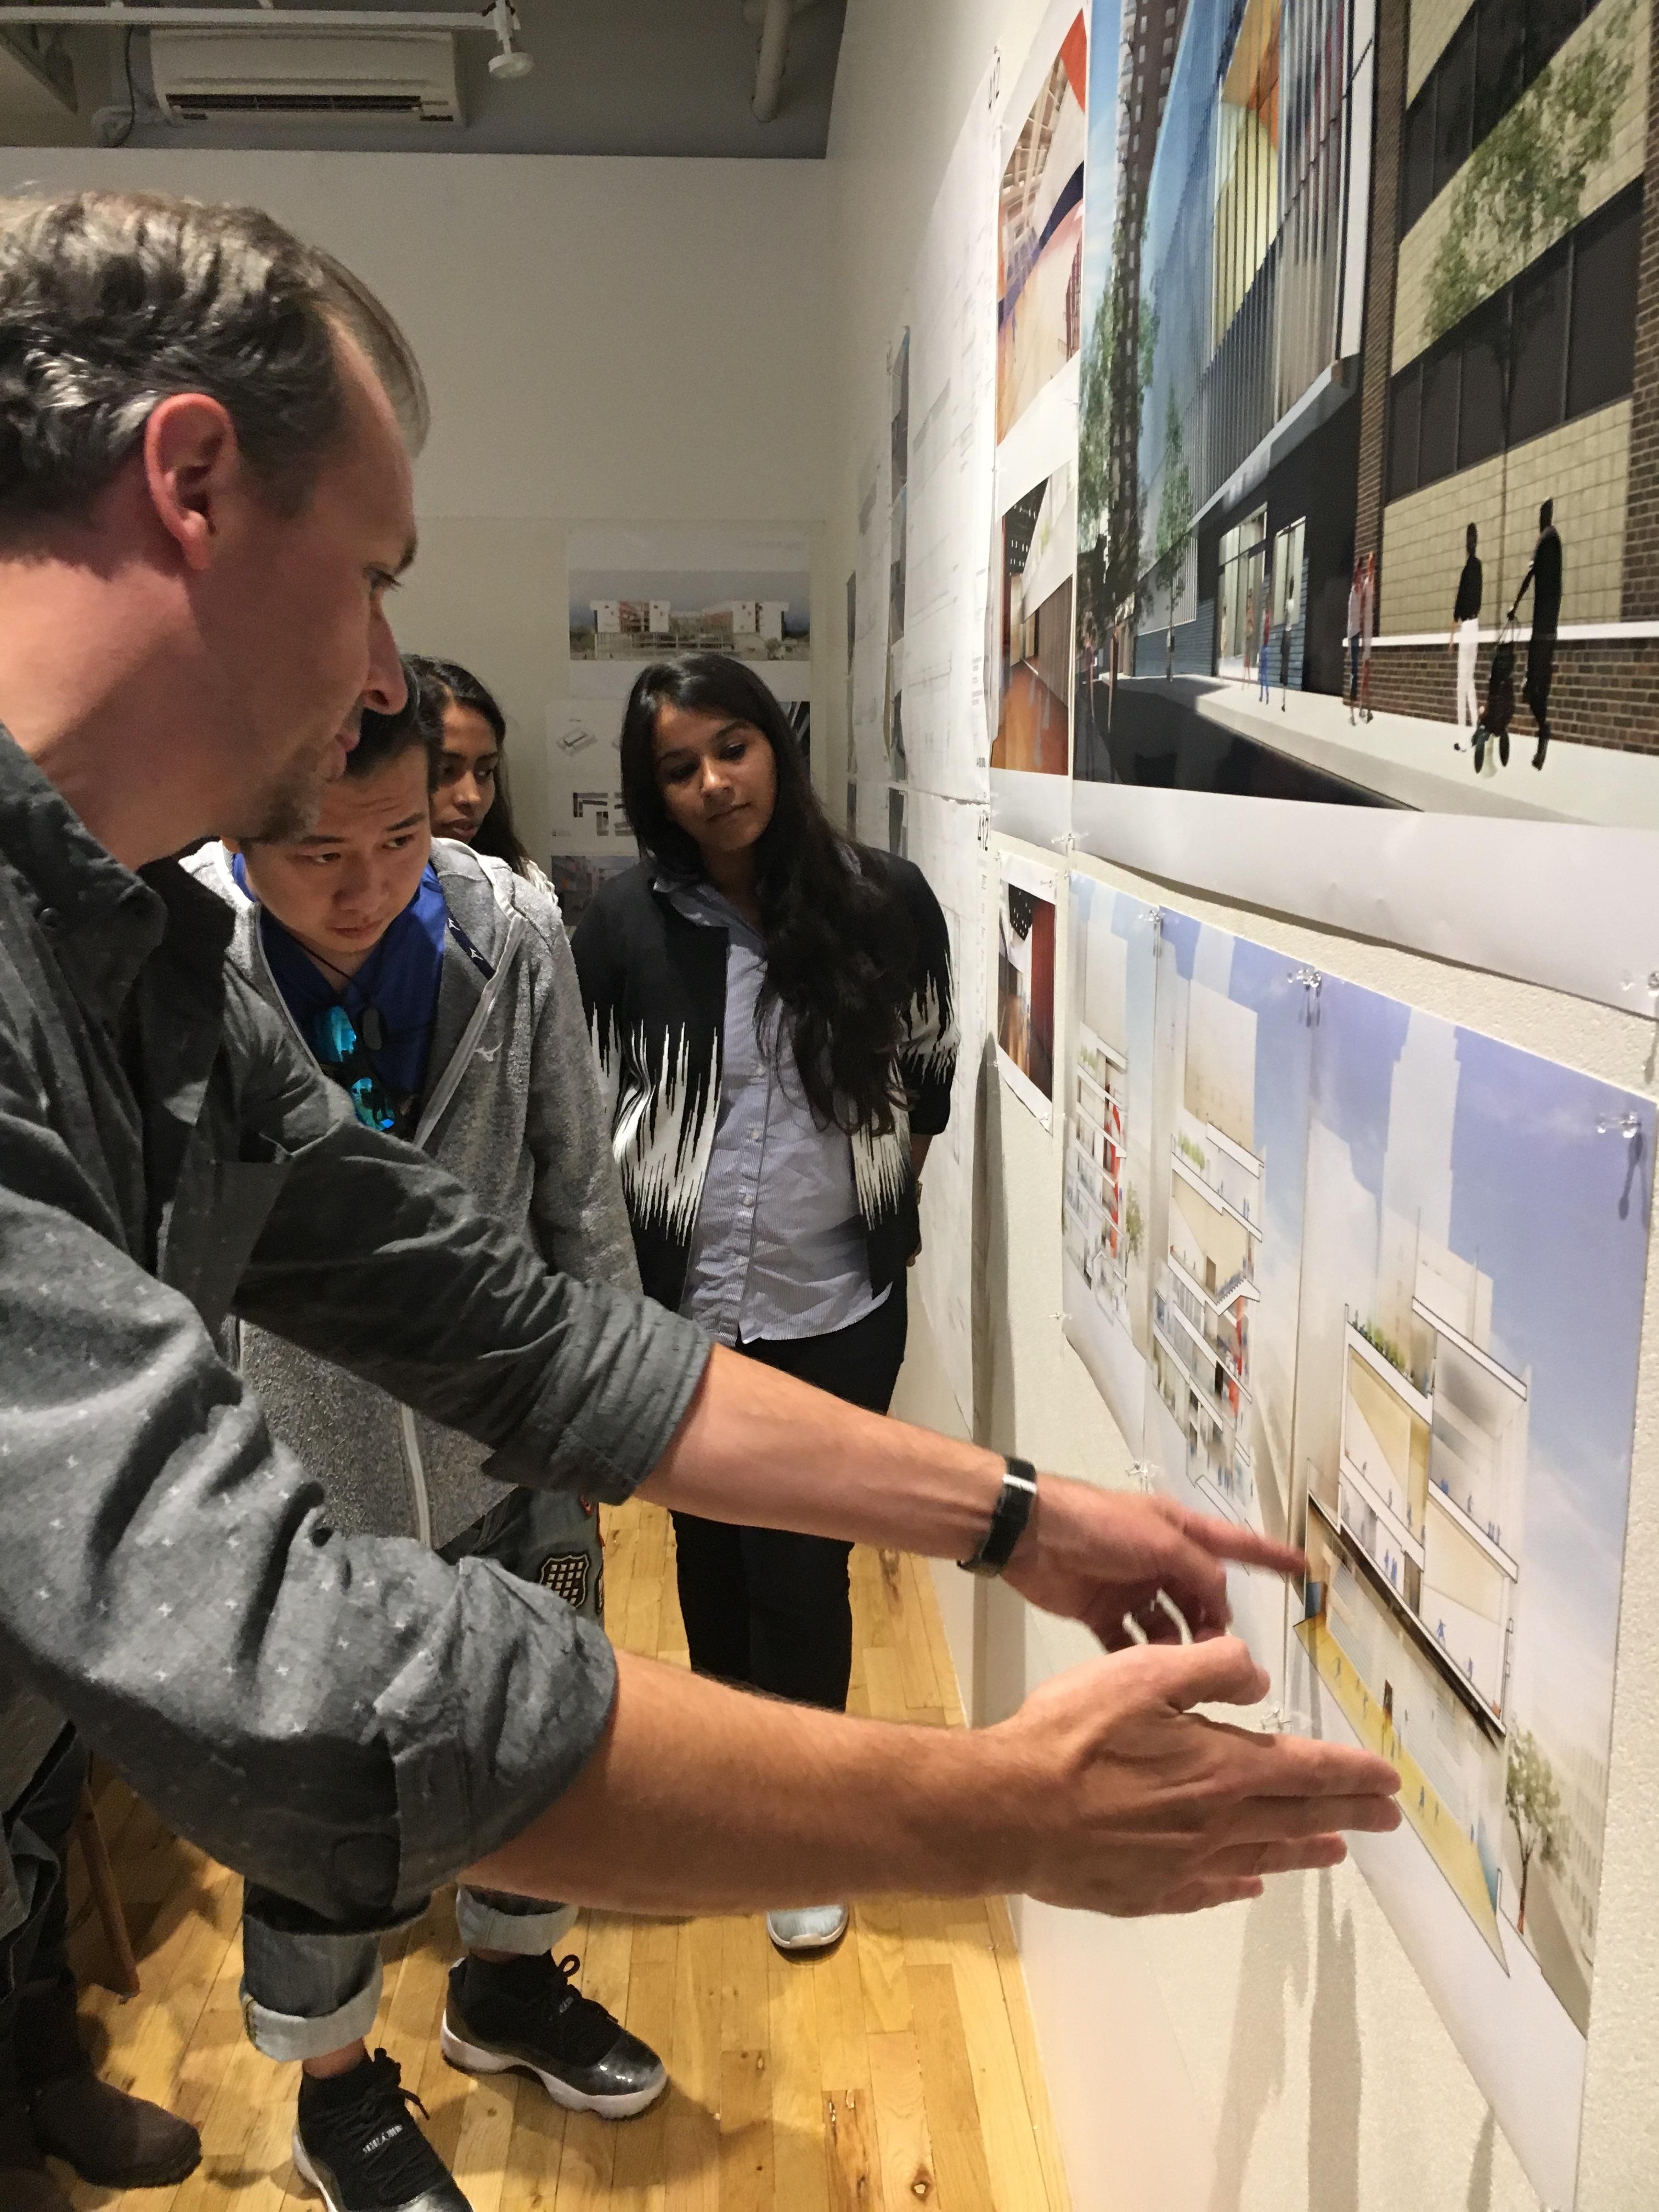 Students receiving instruction in Externship program